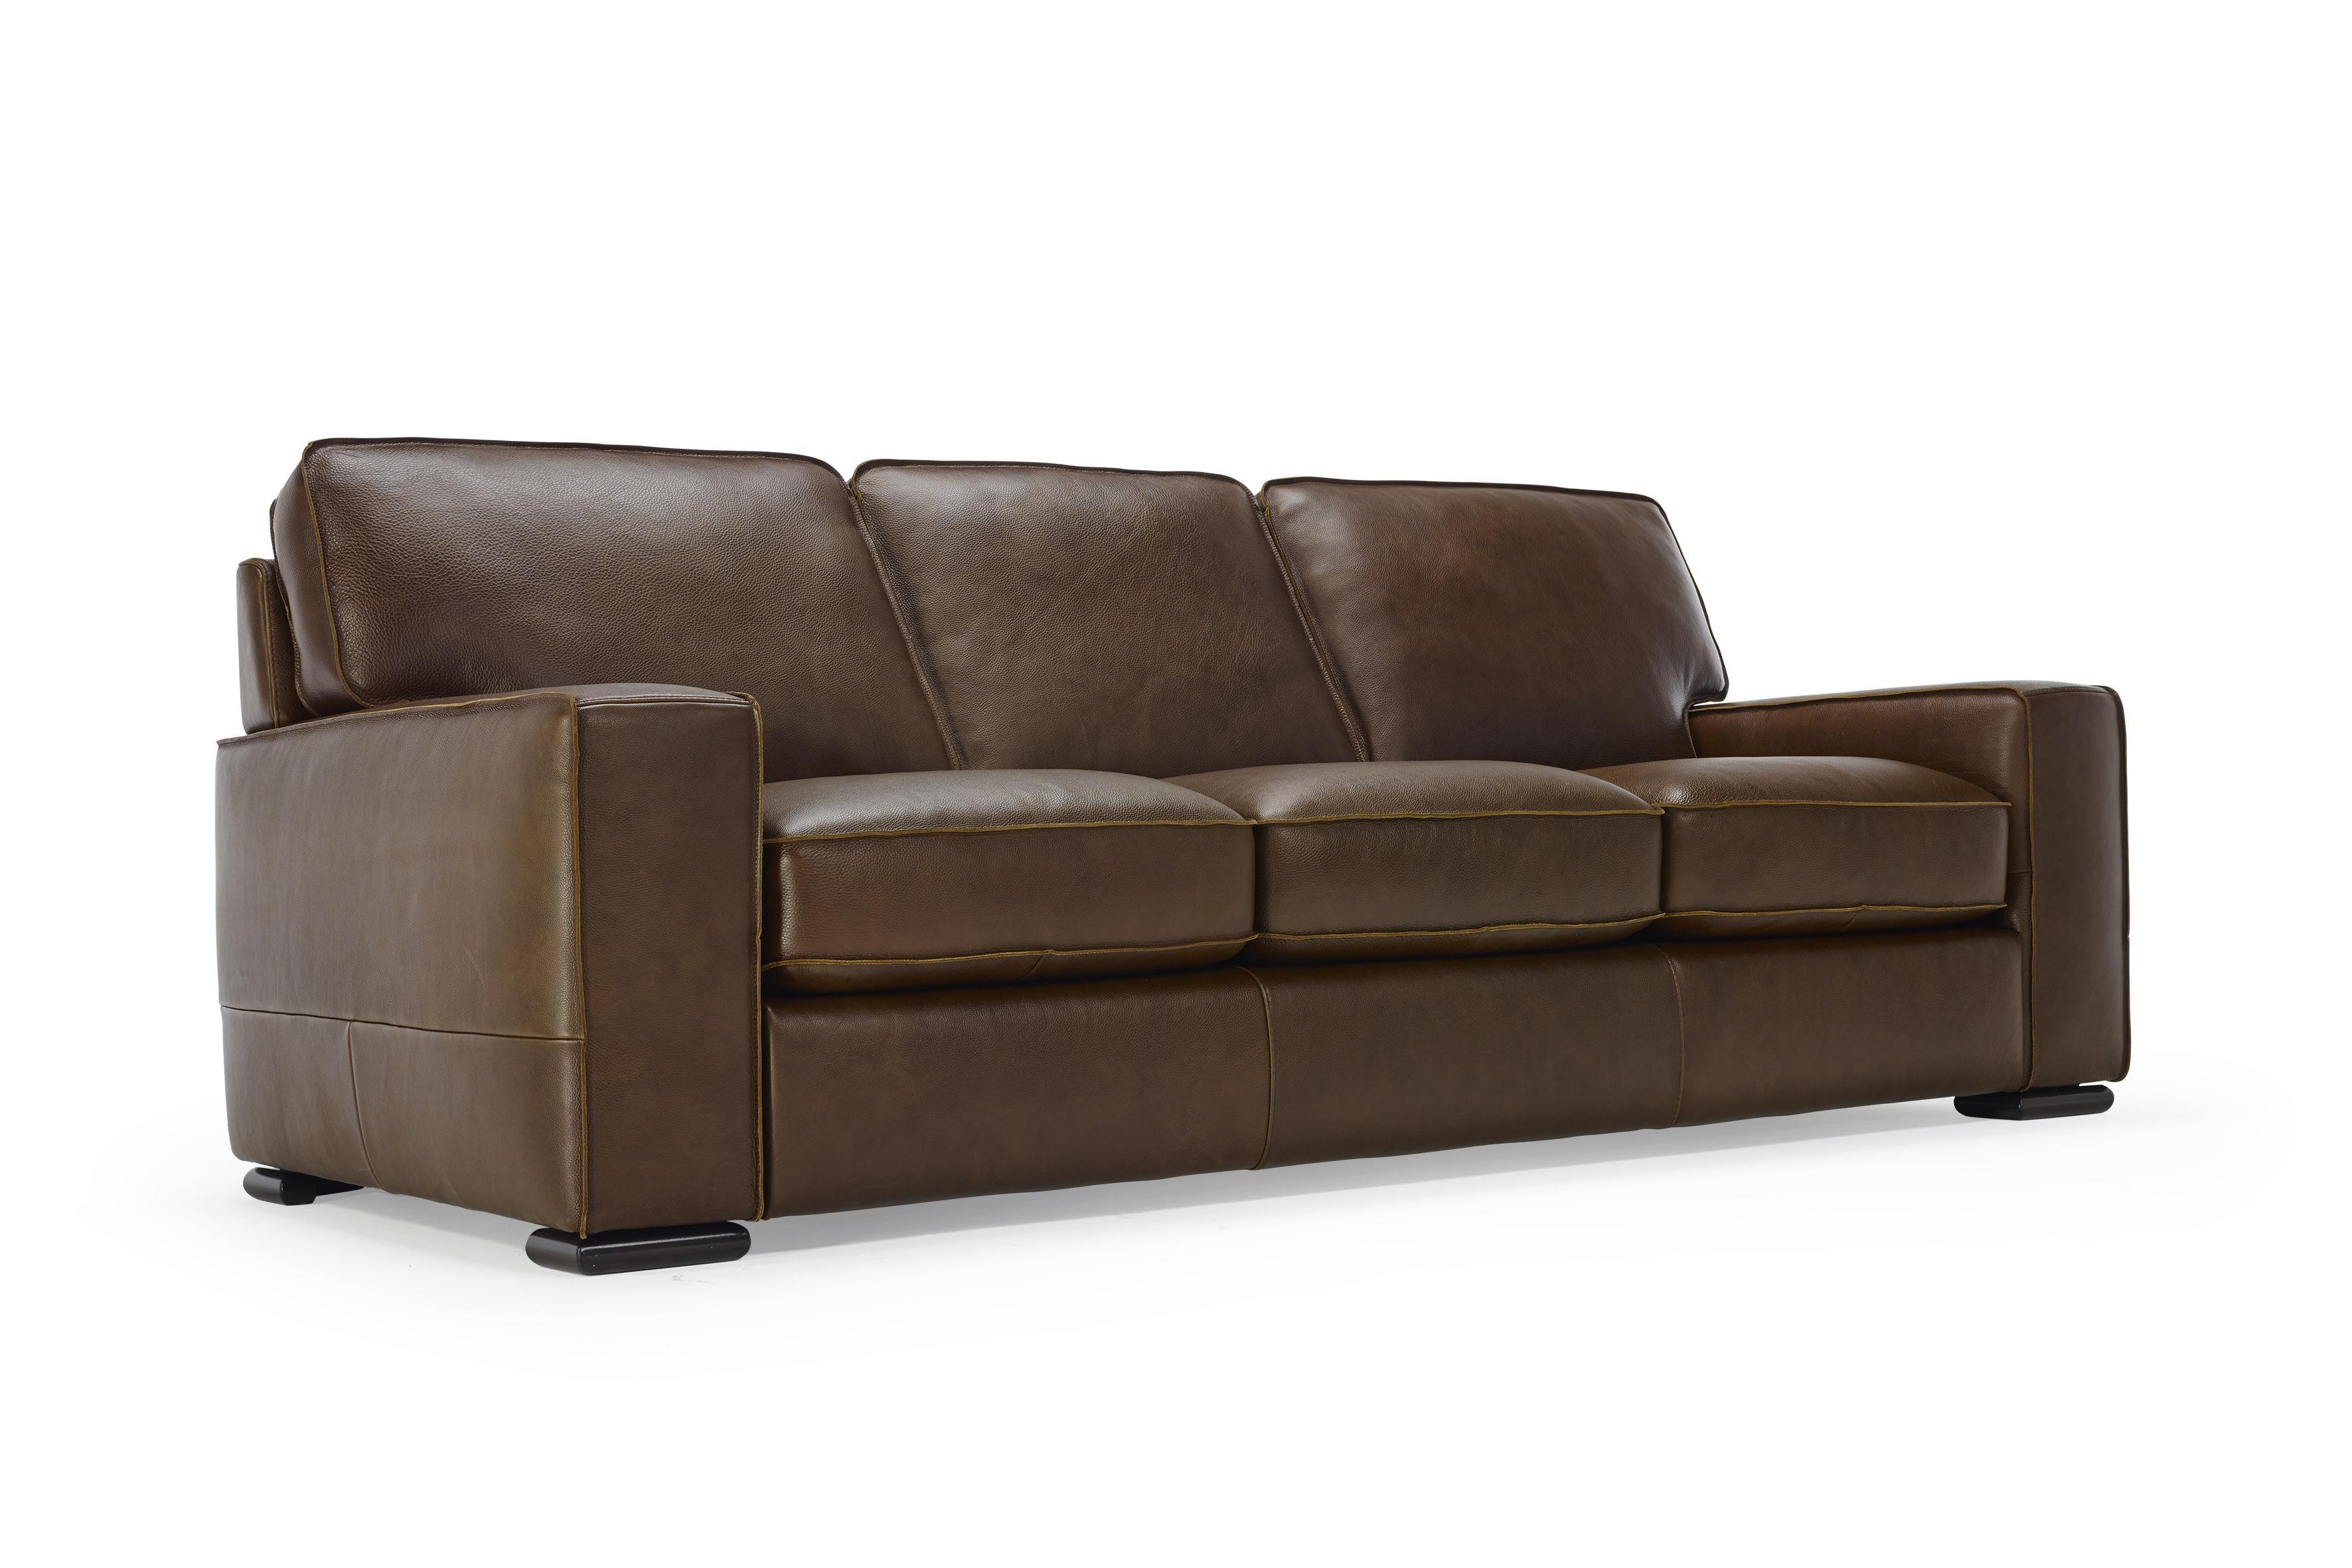 Natuzzi Editions Campania Sofa Sears Canada Furniture Online